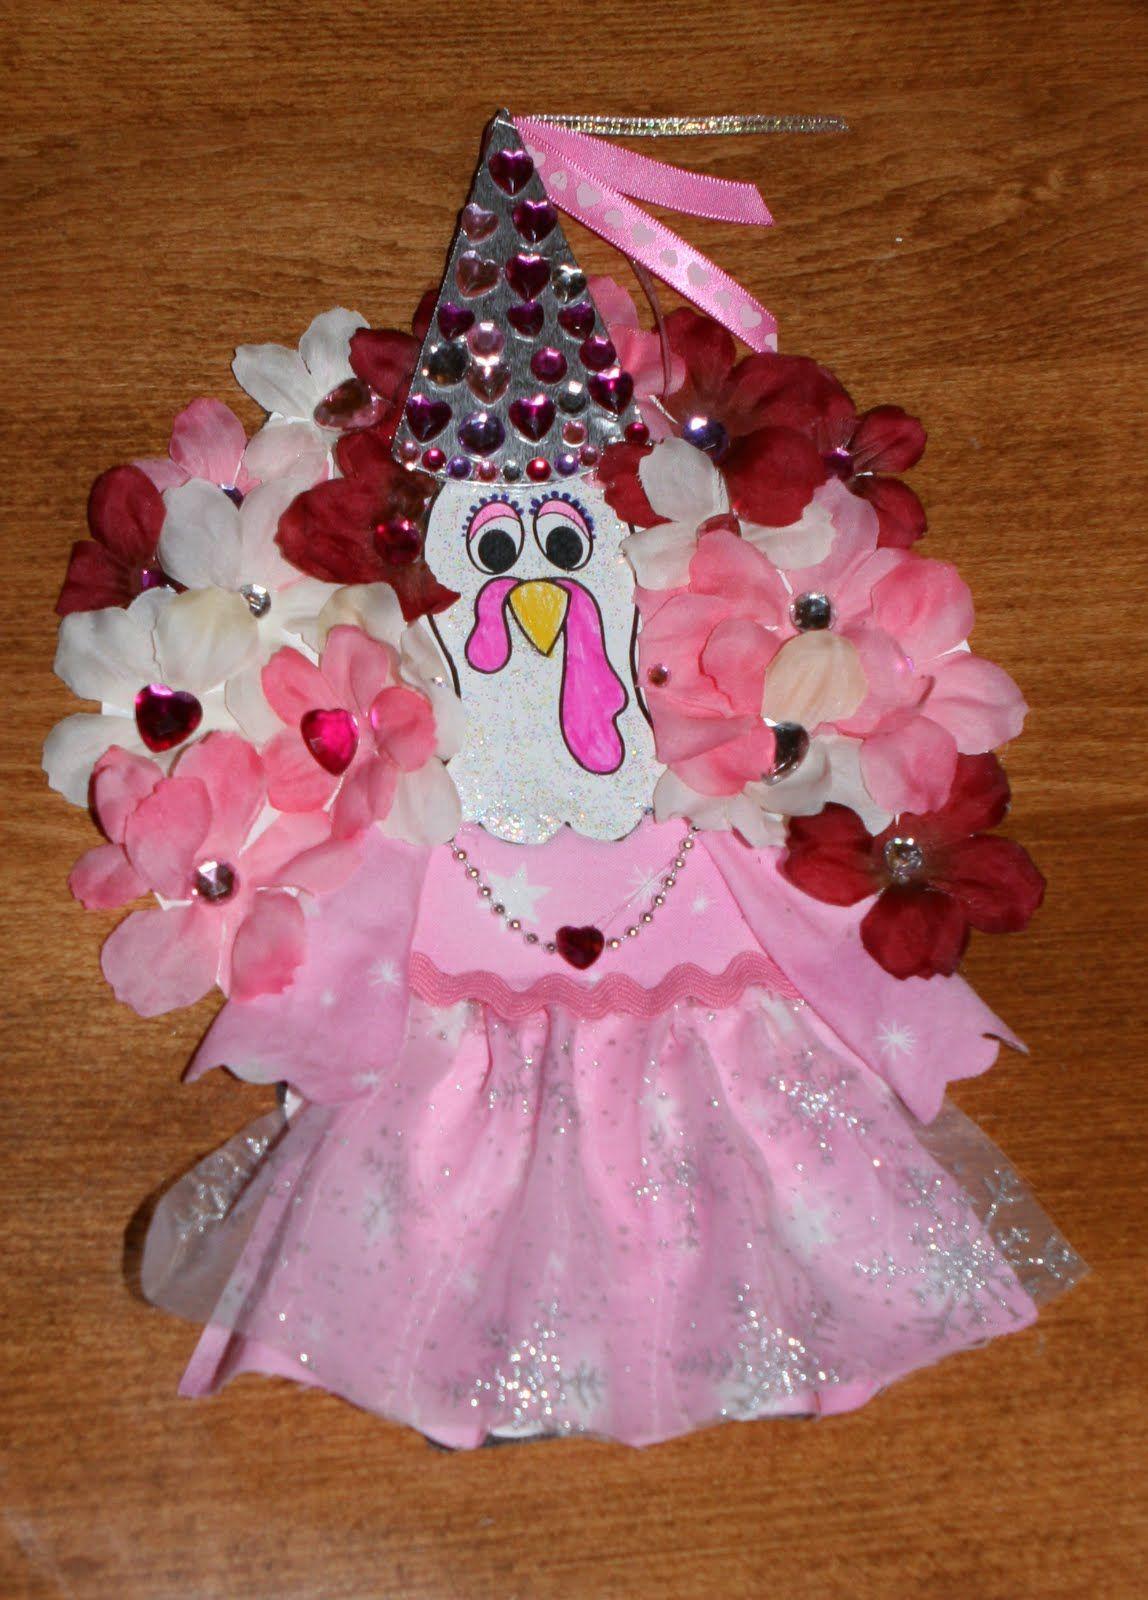 Disguise A Turkey As A Princess